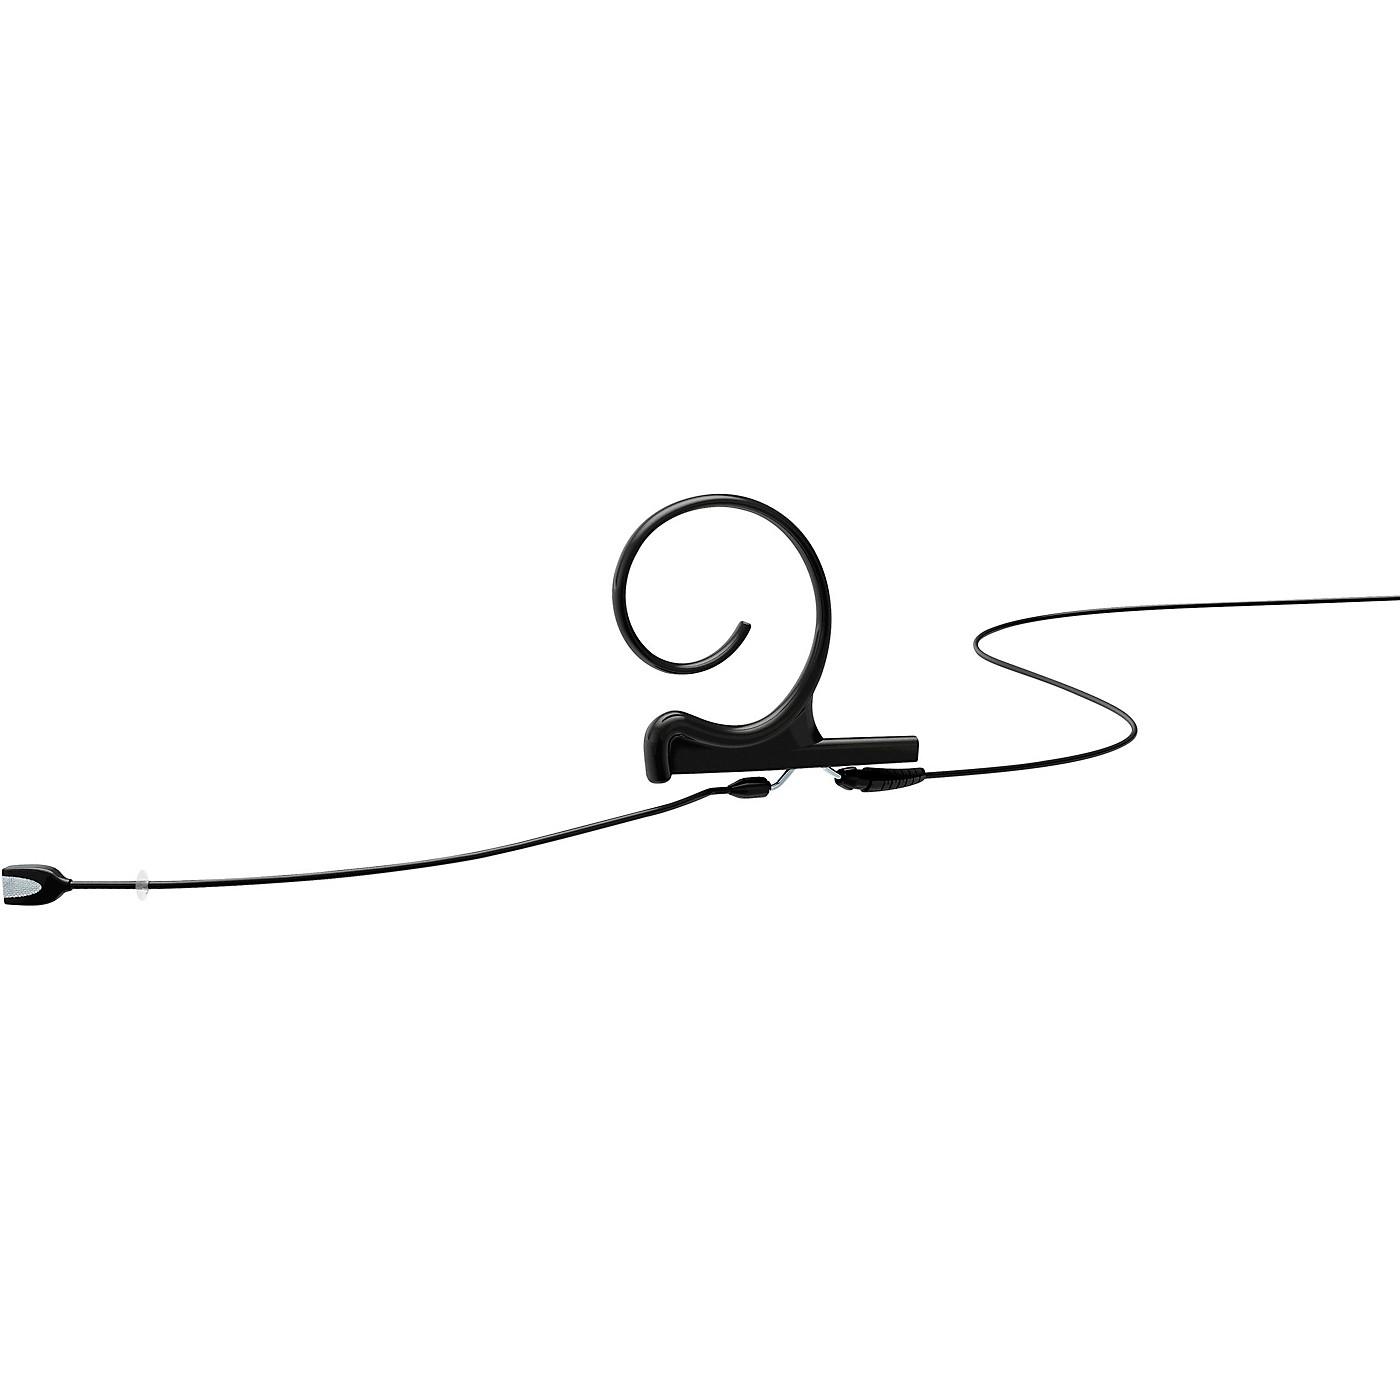 DPA Microphones d:fine Cardioid Slim capsule, headset mic., Single ear, 100mm boom, Microdot, Black thumbnail